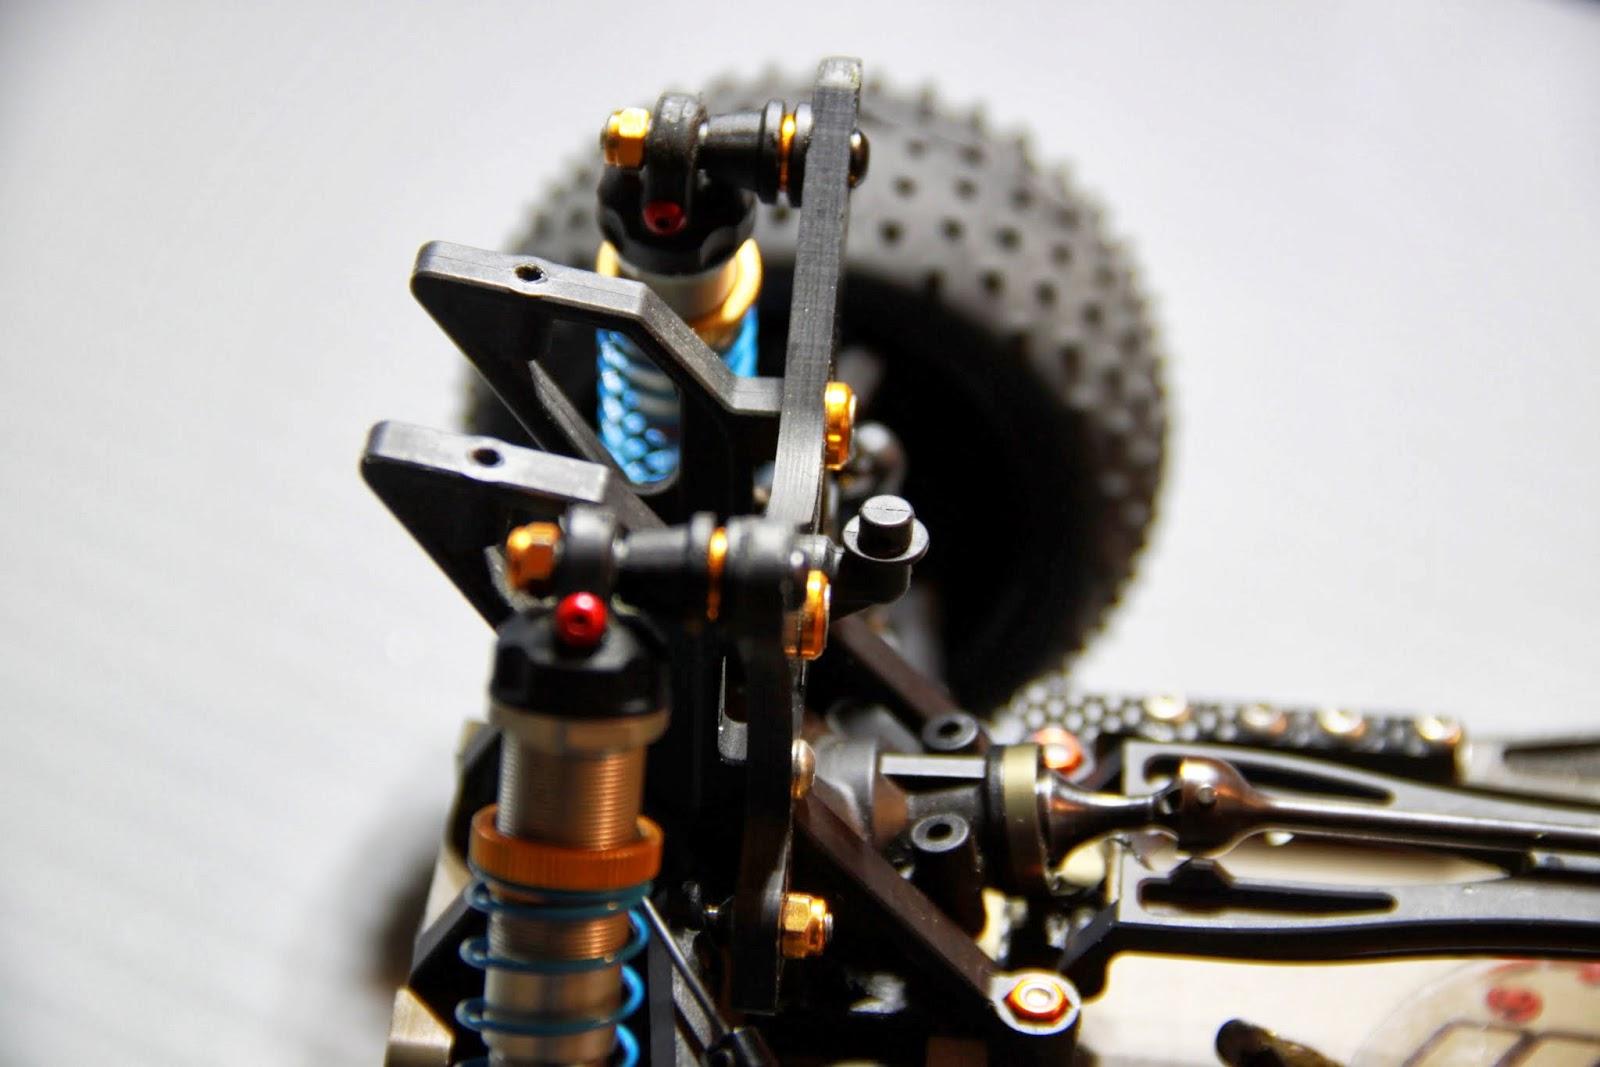 jrt racing montage amortisseur l 39 arri re sur dex410. Black Bedroom Furniture Sets. Home Design Ideas